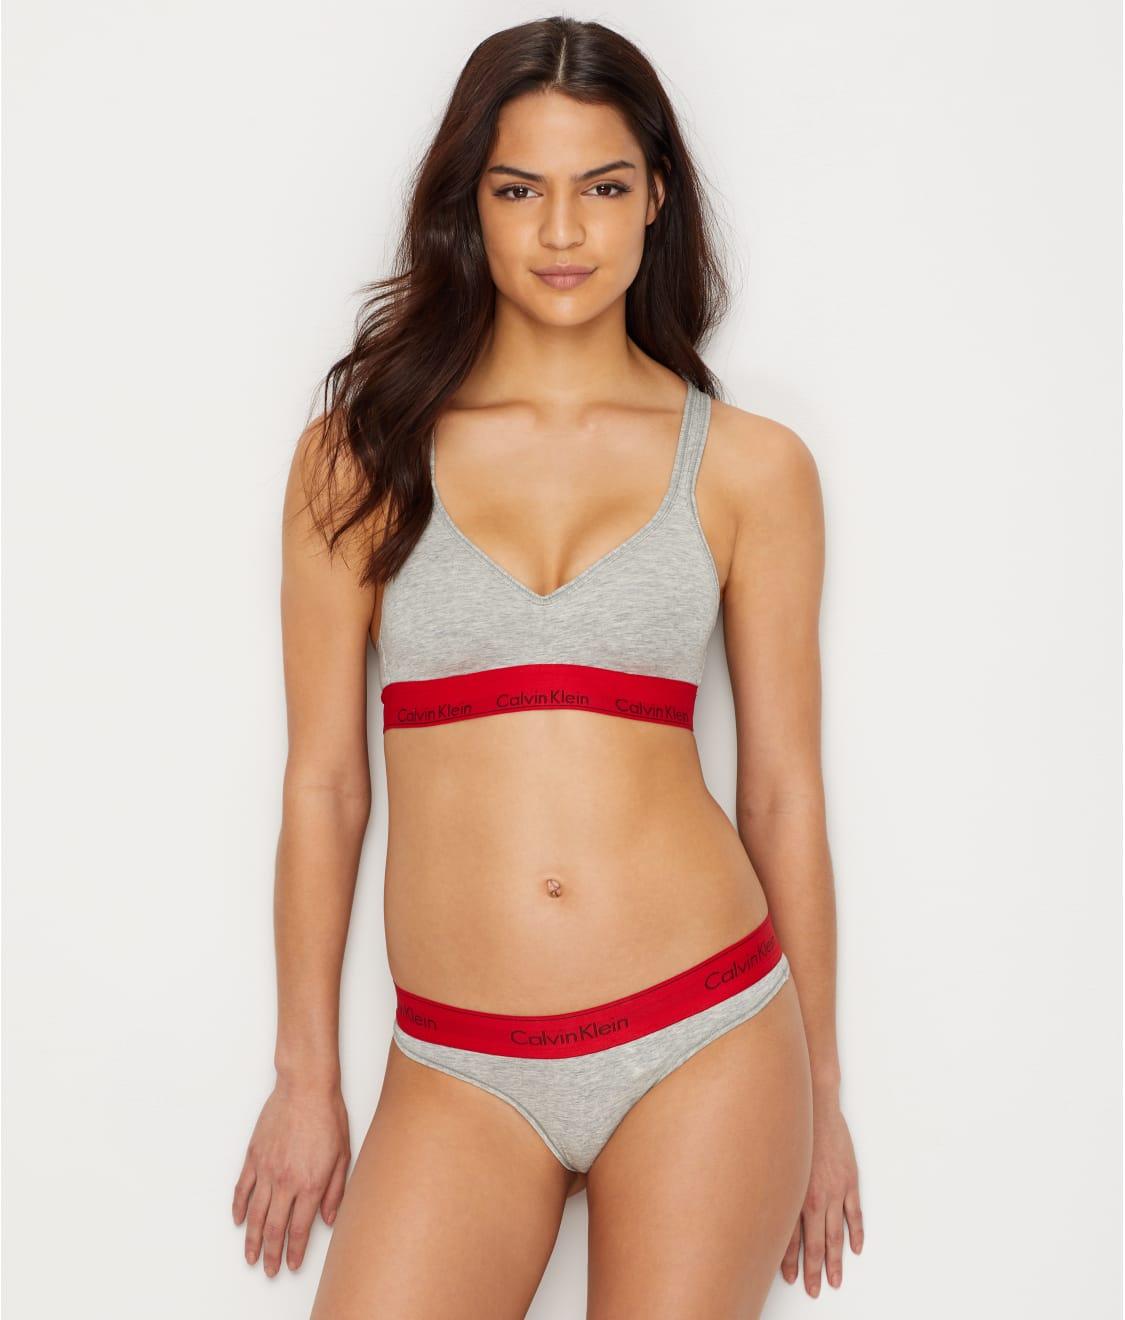 e3d01abd700 See Modern Cotton Padded Bralette in Grey Heather   Red. Calvin Klein  ...